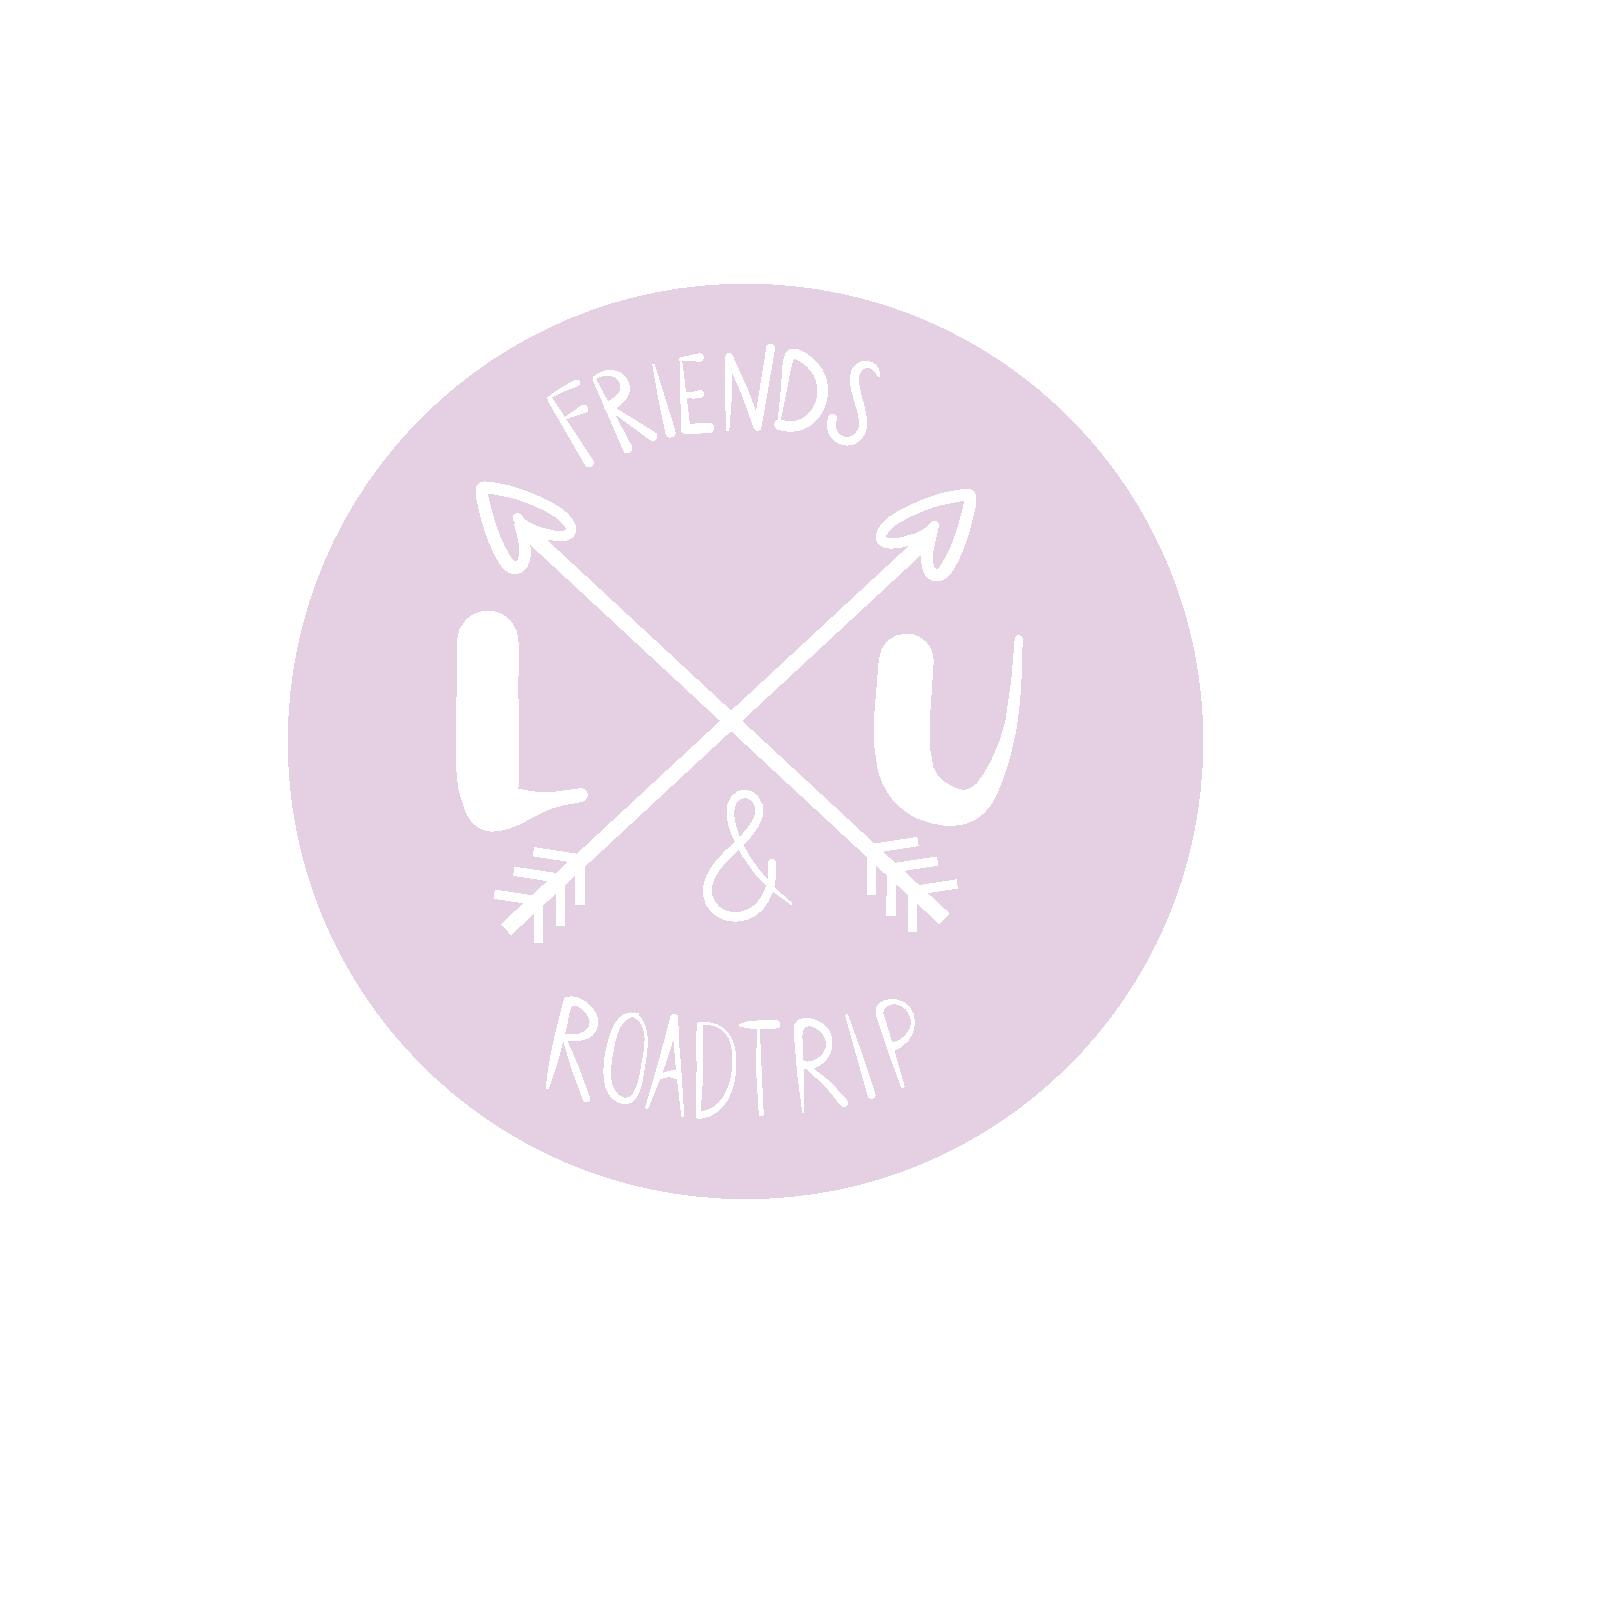 friends roadtrip_pink-page-001.jpg